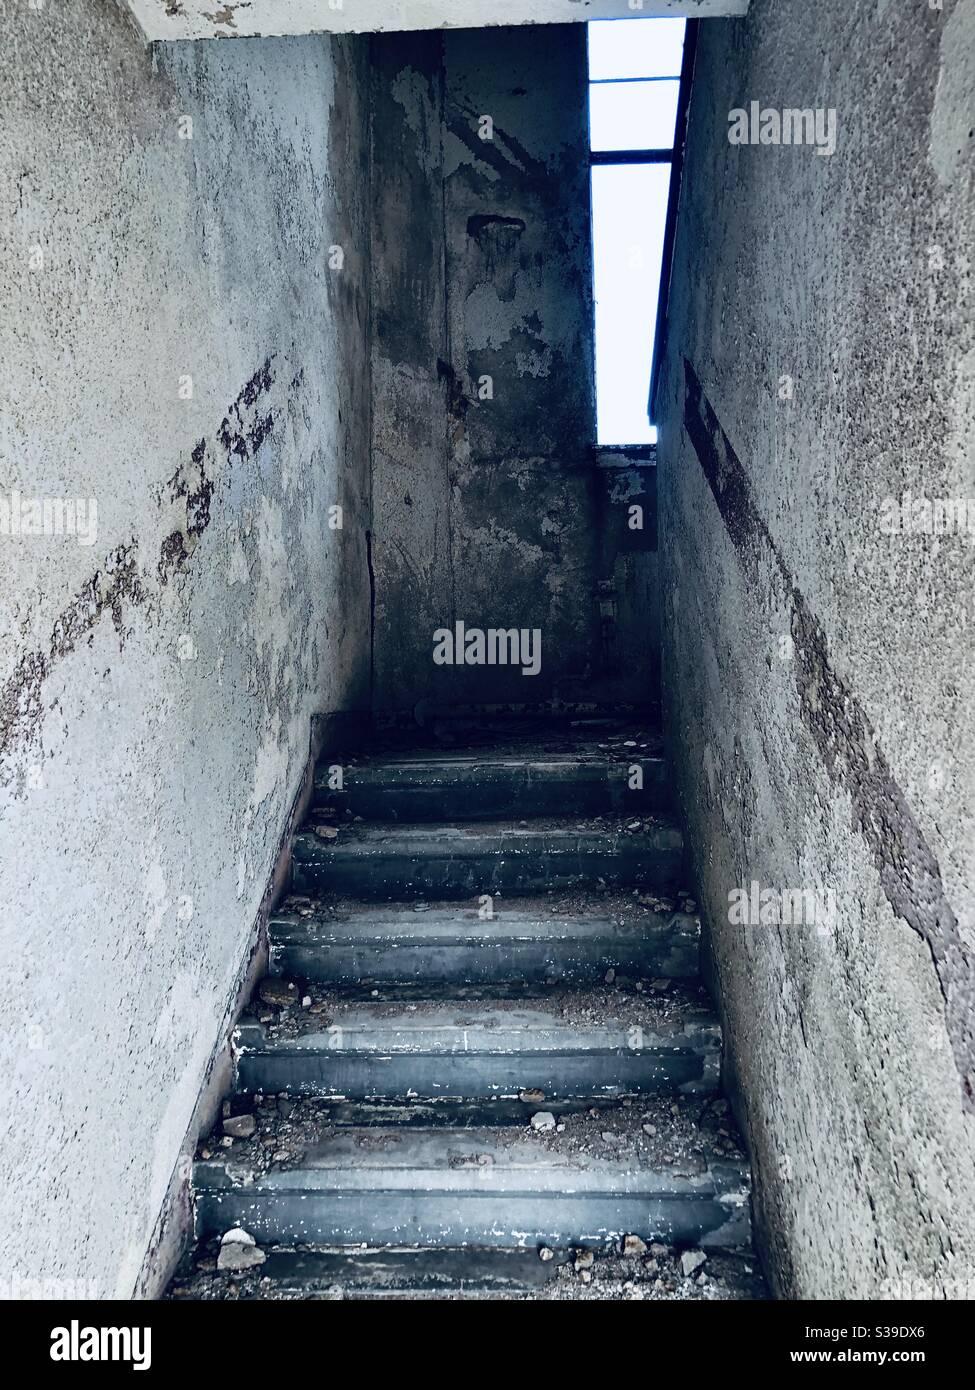 La escalera daba miedo Foto de stock